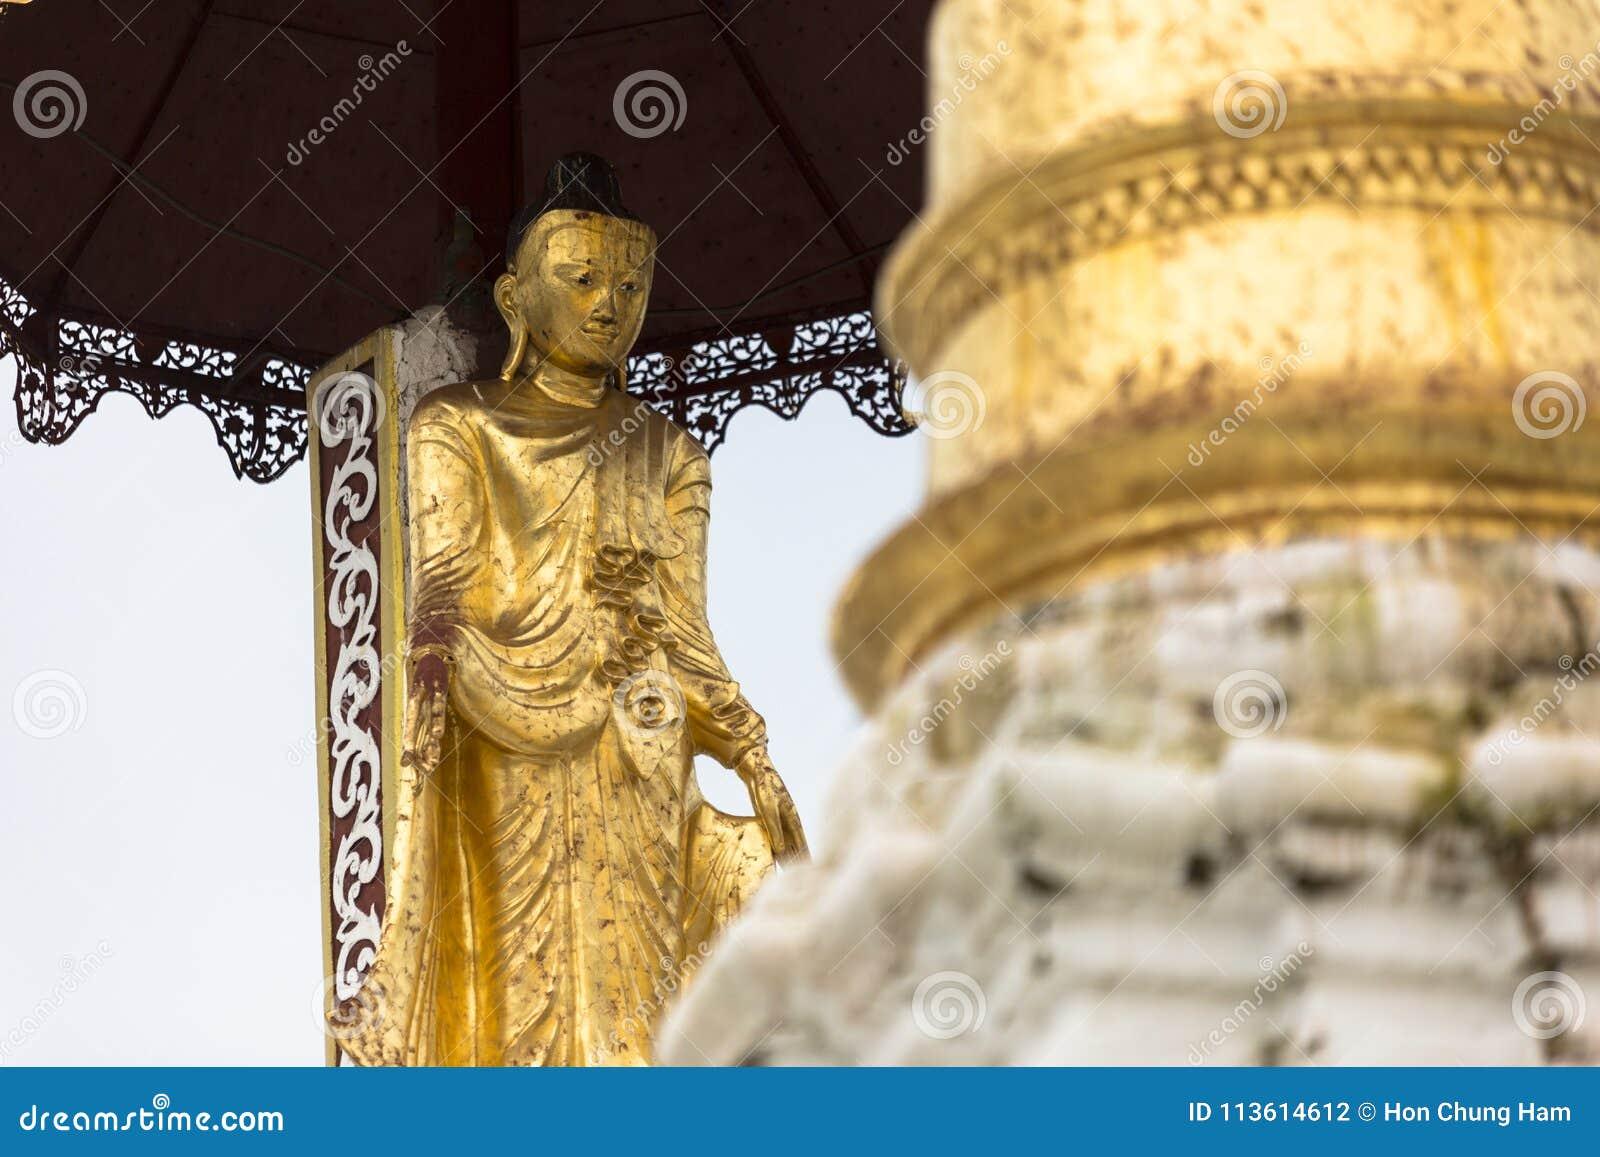 Arquitetura tradicional do templo do stupa dourado no pagode Yangon Myanmar 3Sudeste Asiático do shwedagon